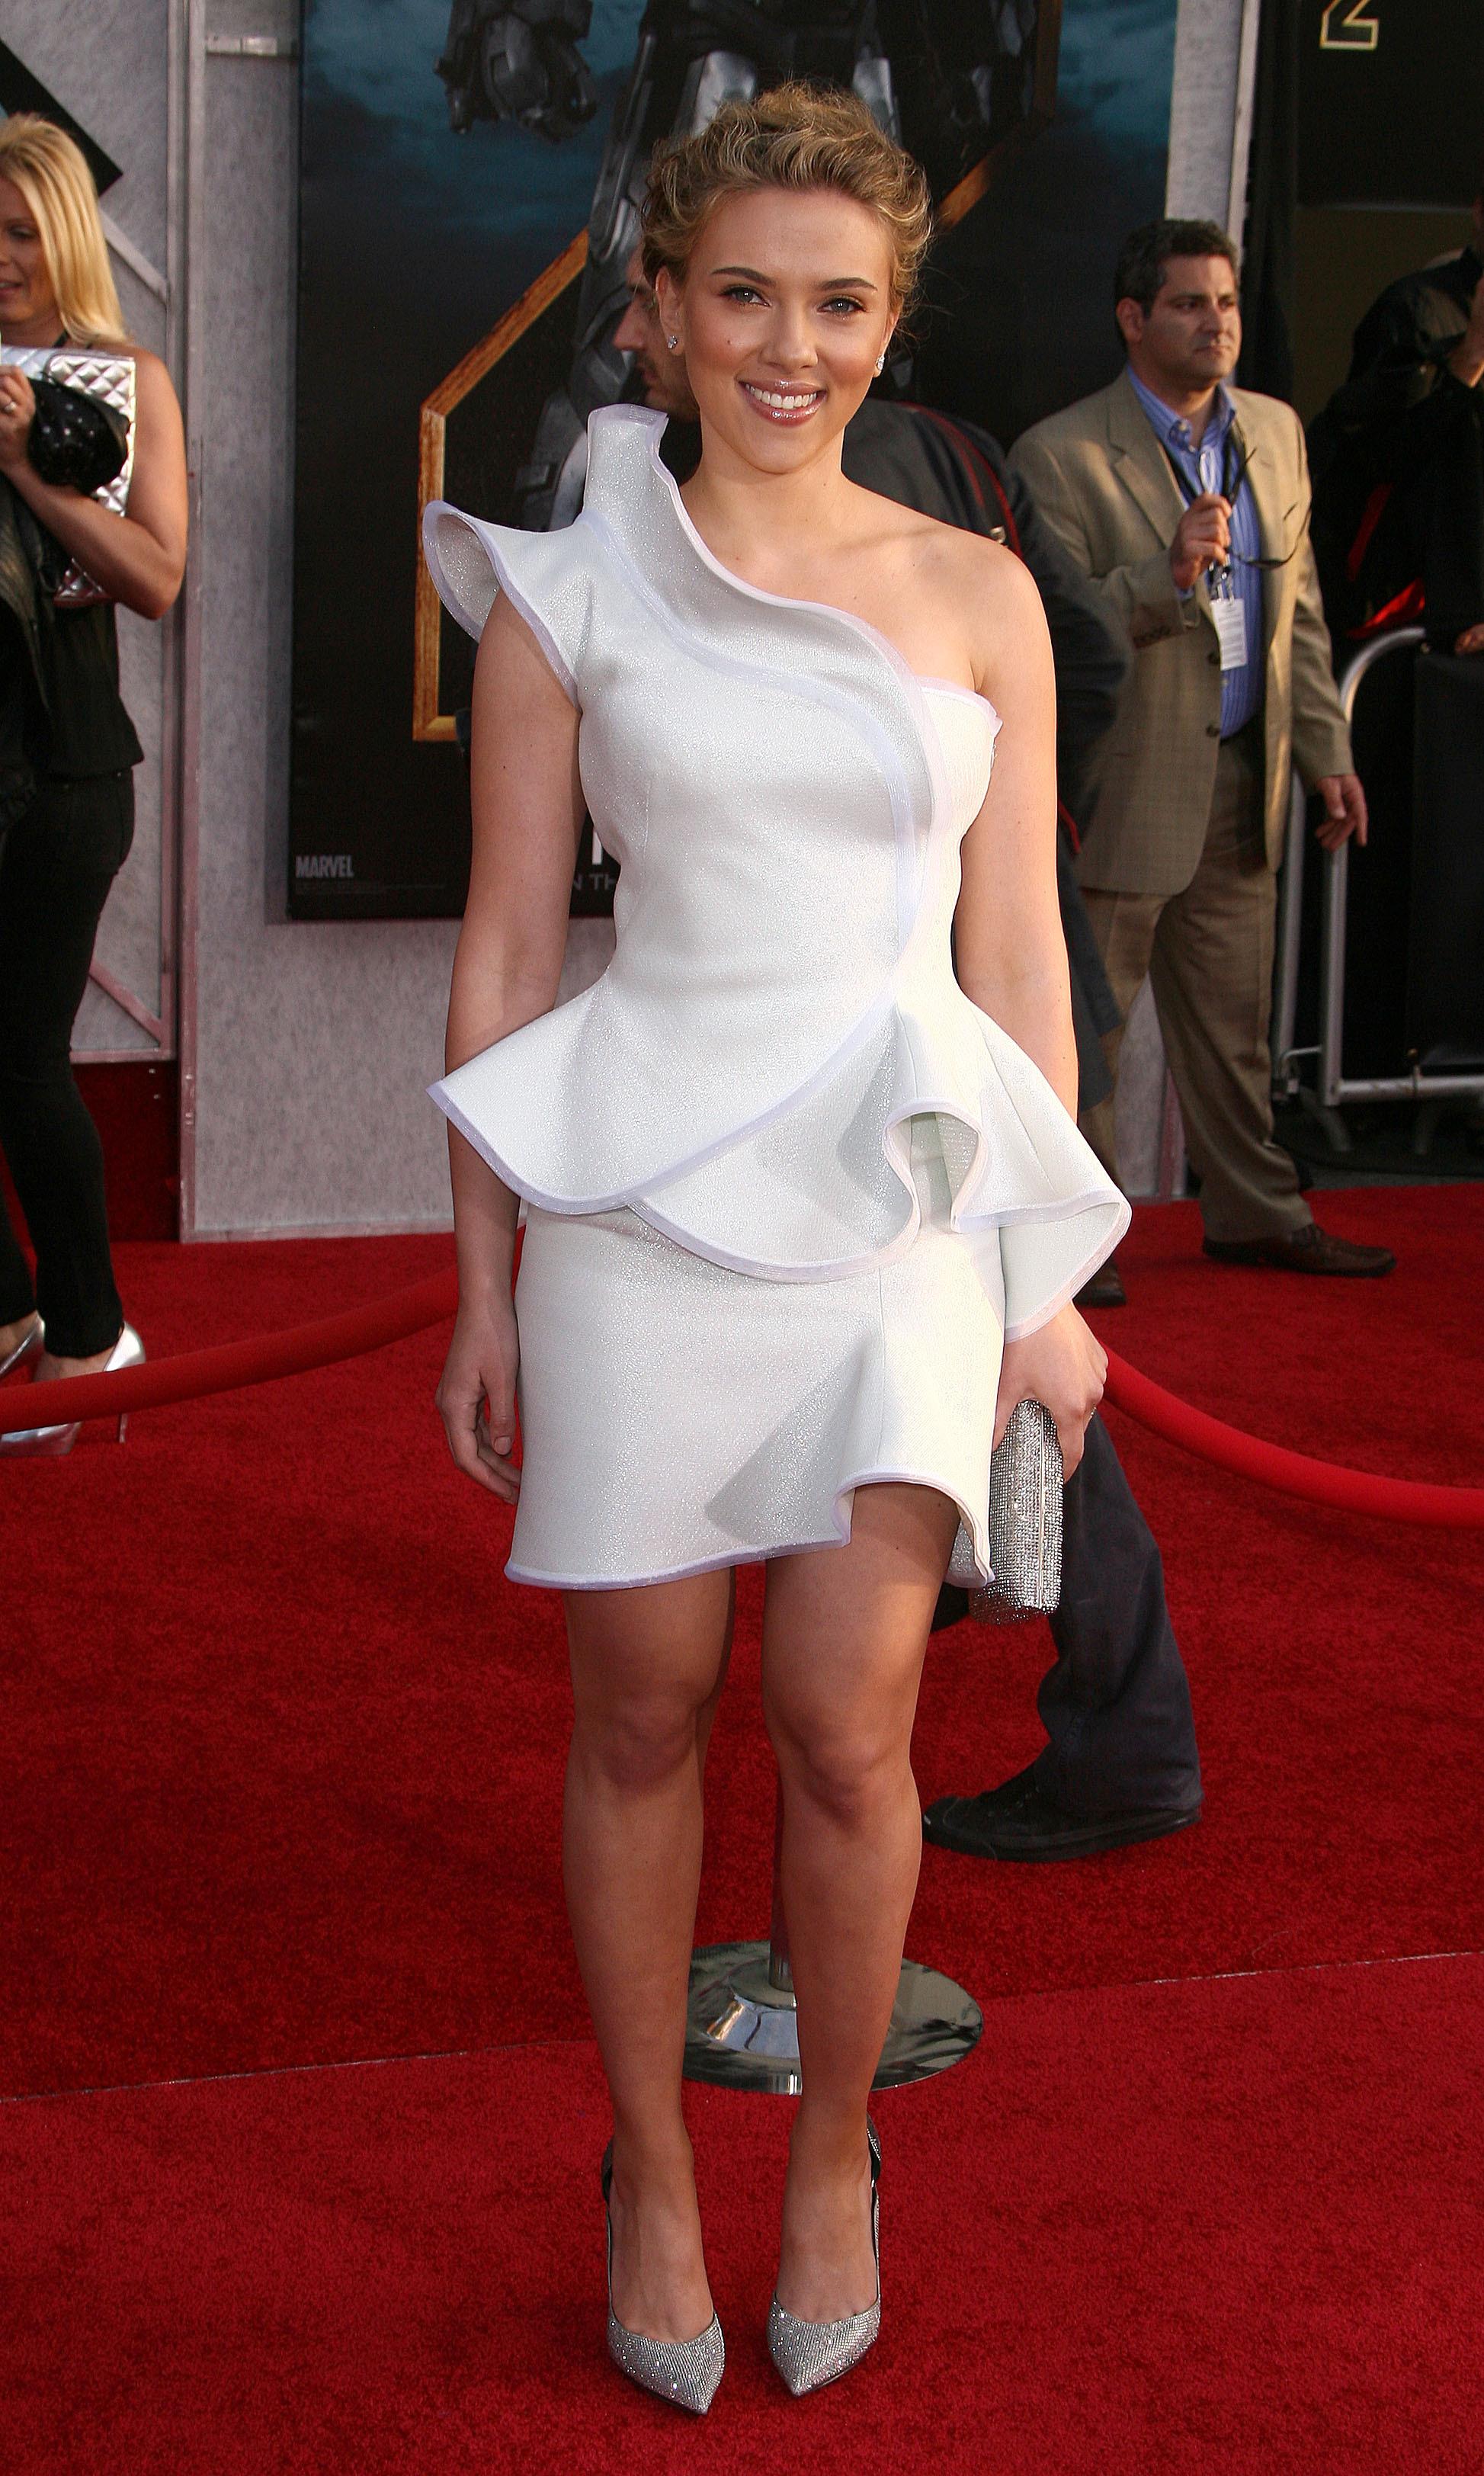 50651_celebrity_paradise.com_Scarlett_Johansson_Iron_Man_2_World_Premiere_in_Hollywood_26.04.2010_08_122_110lo.jpg